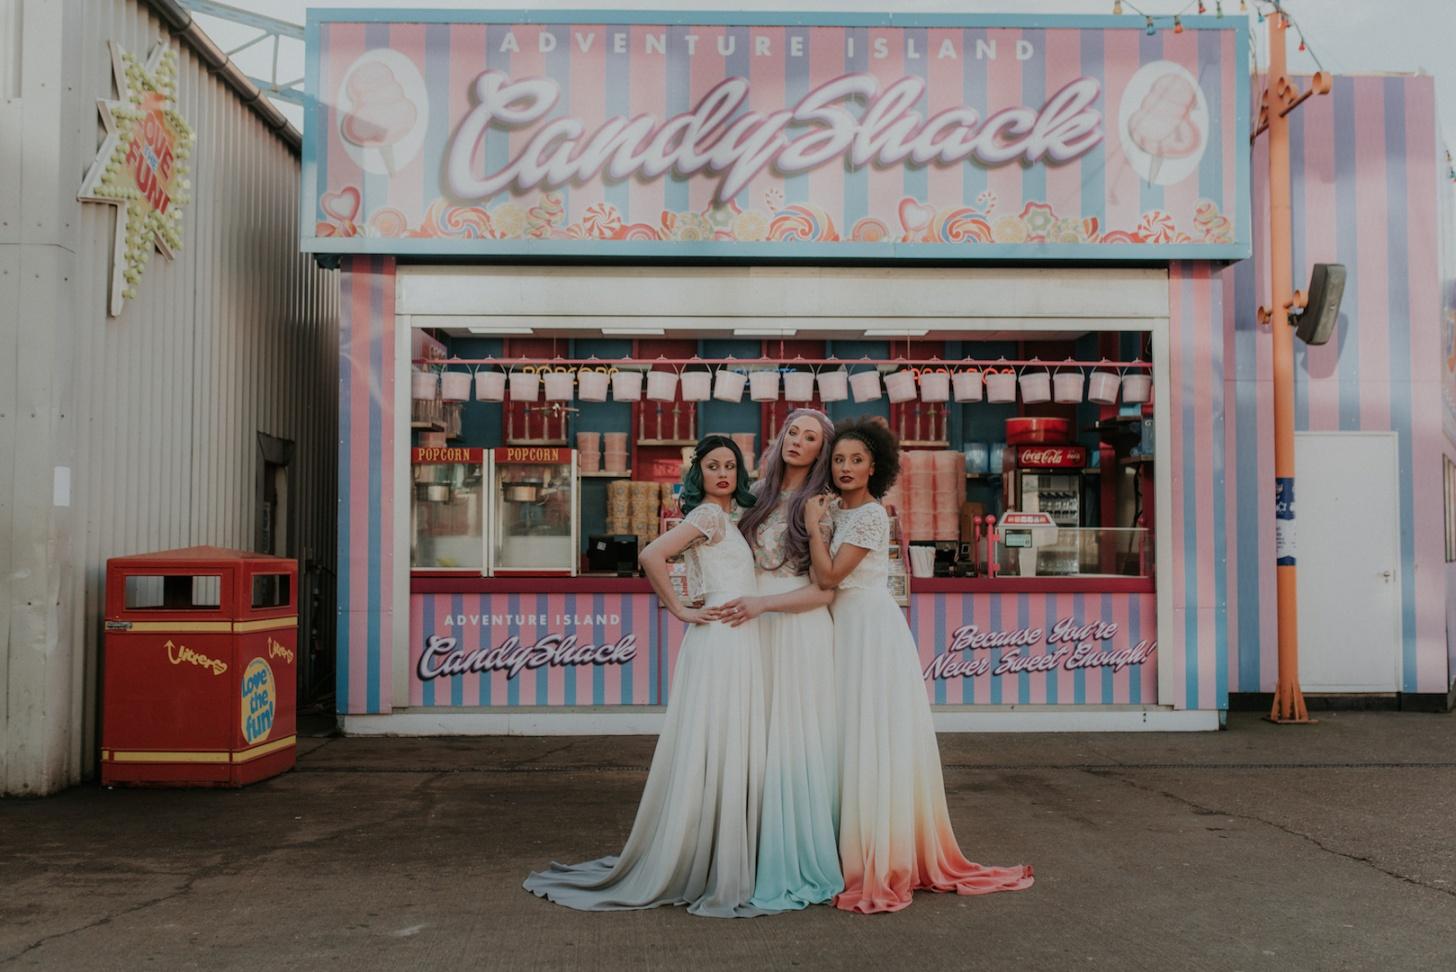 Lucy Can't Dance - Dip Dye Bridal wear - alternative bridal wear - unique wedding dress - Megan Elle Photography - quirky wedding dress